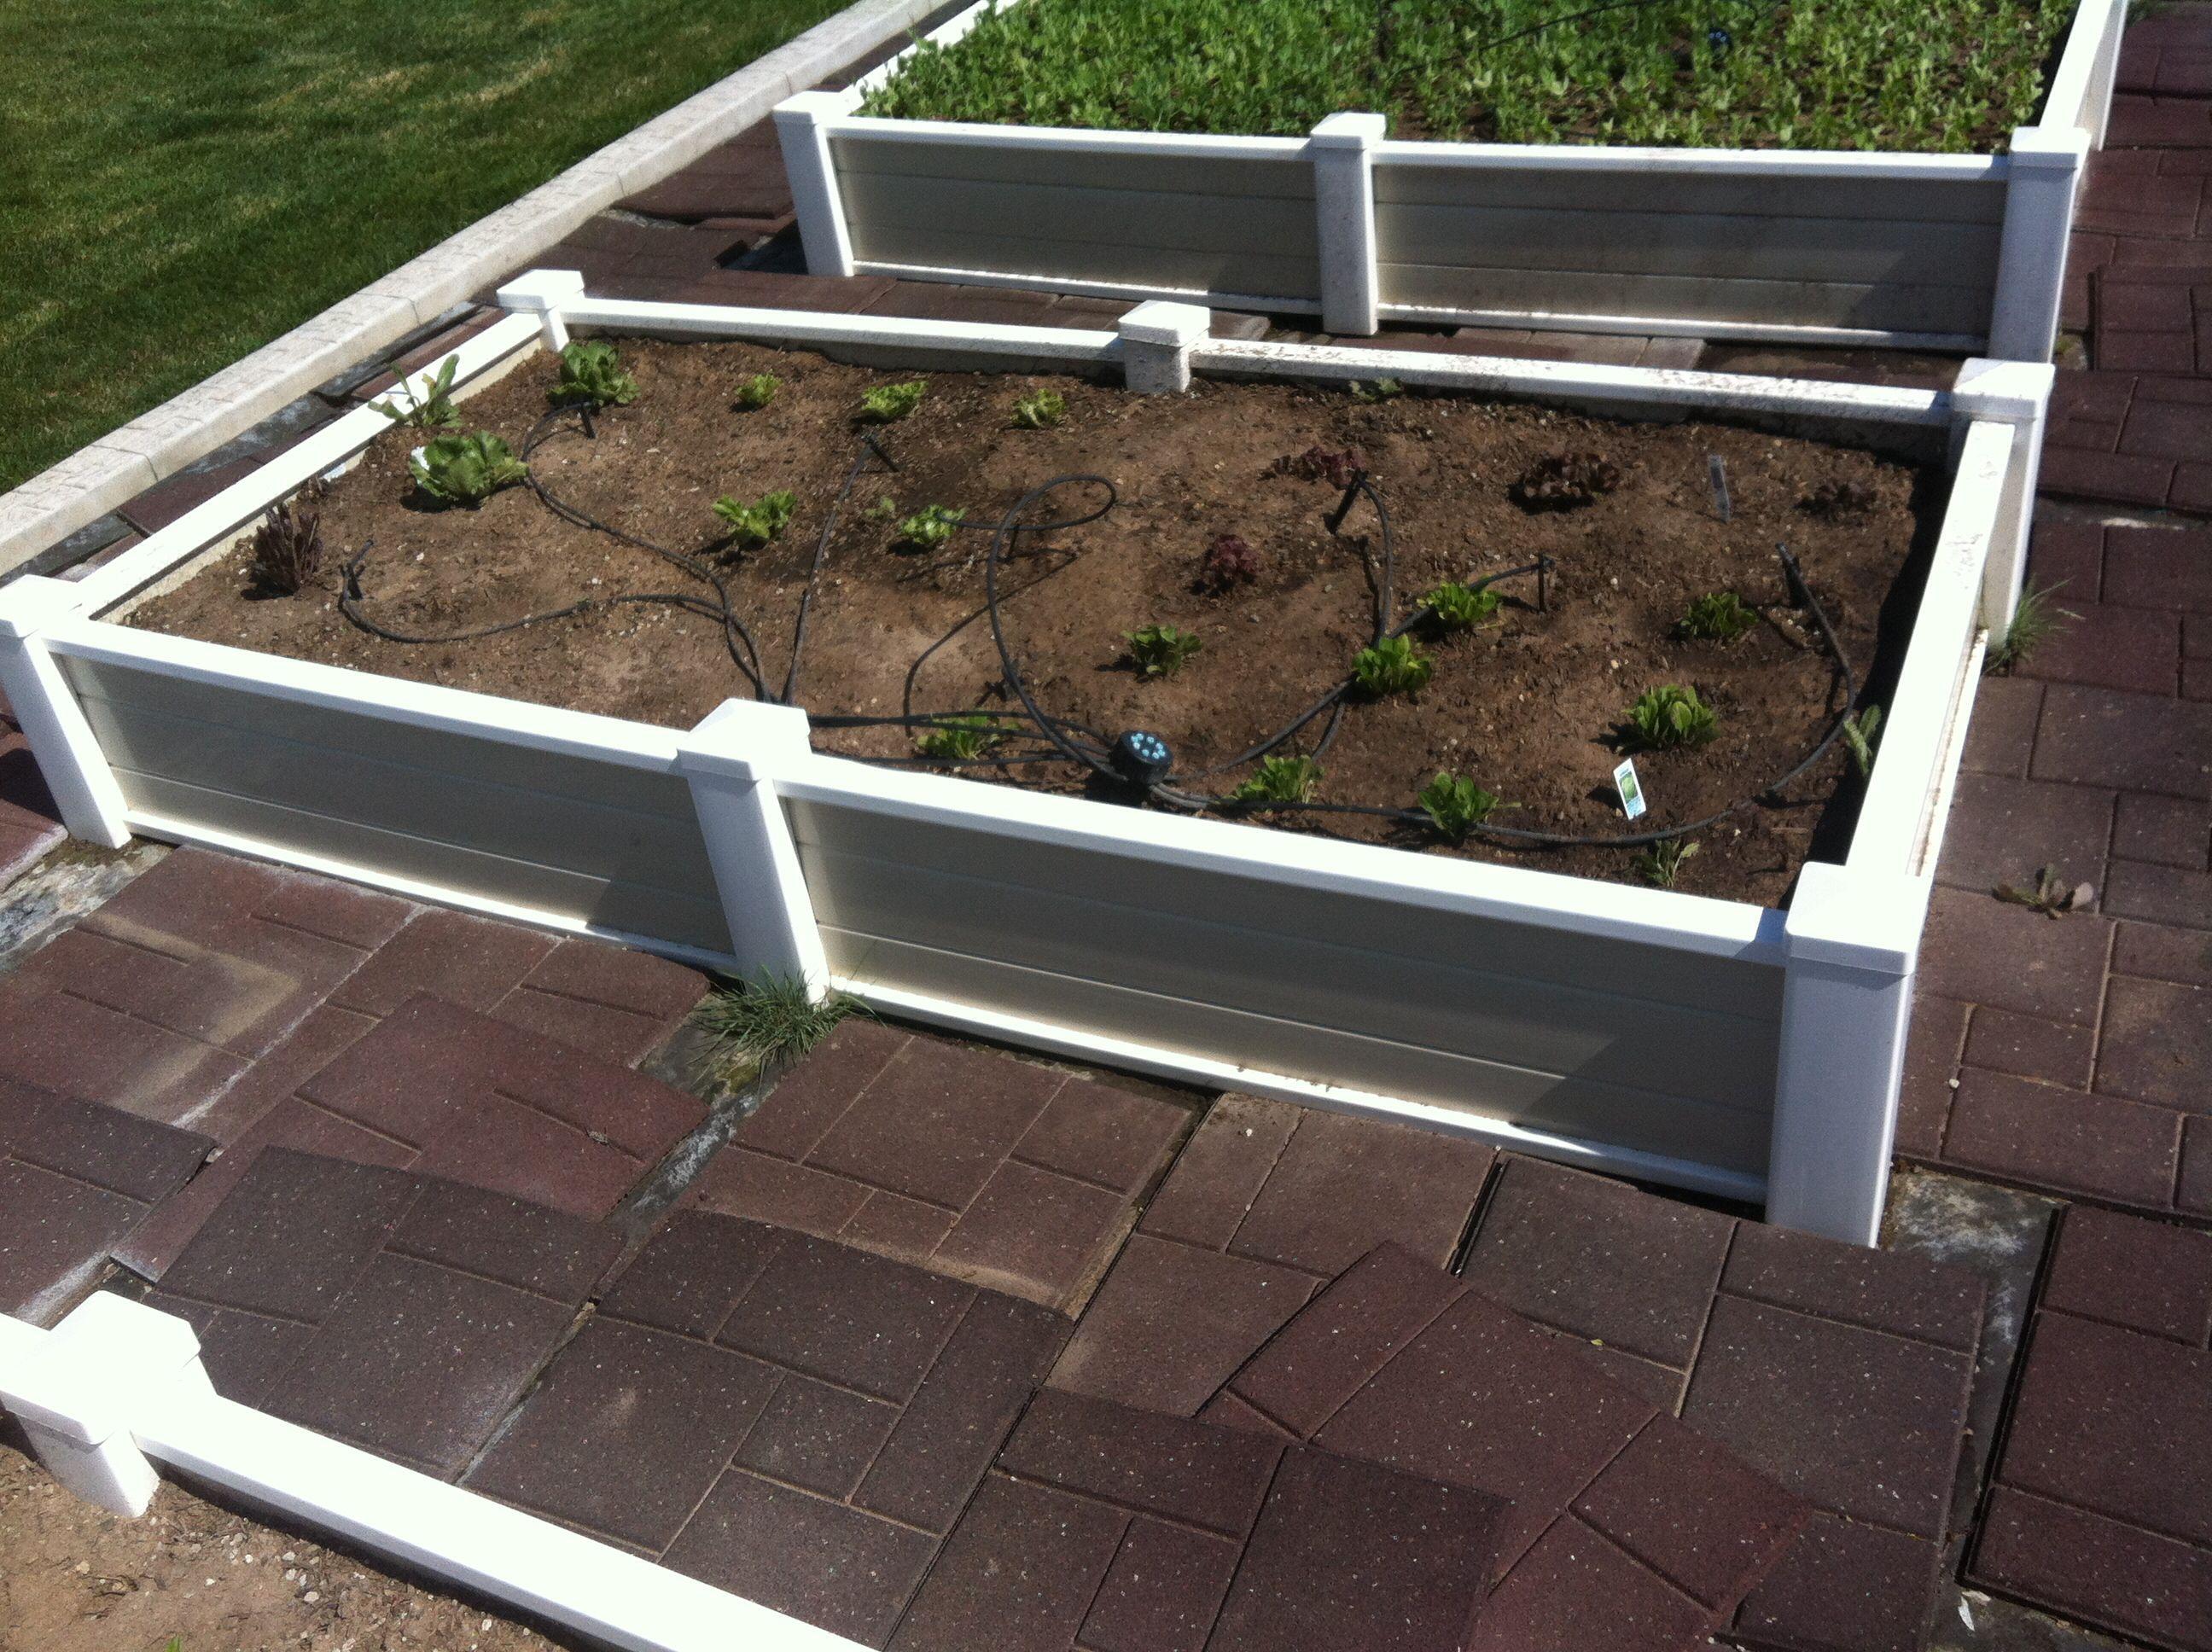 Vinyl Raised Bed Garden Planters Vegetable Garden Raised Beds Raised Garden Beds Garden Beds